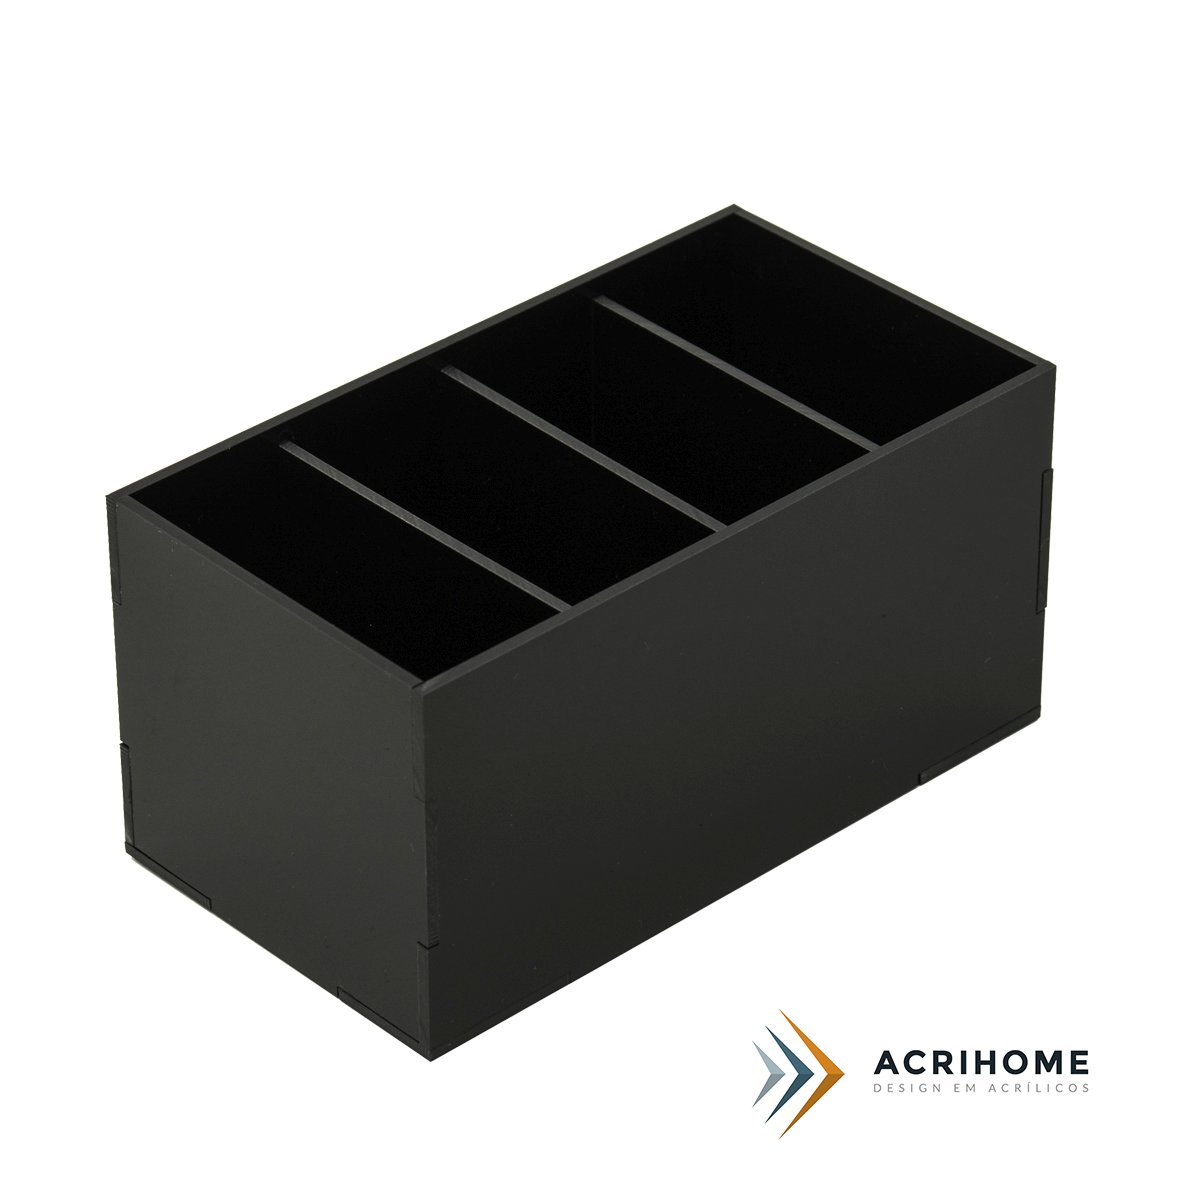 Porta controle remoto de acrílico preto